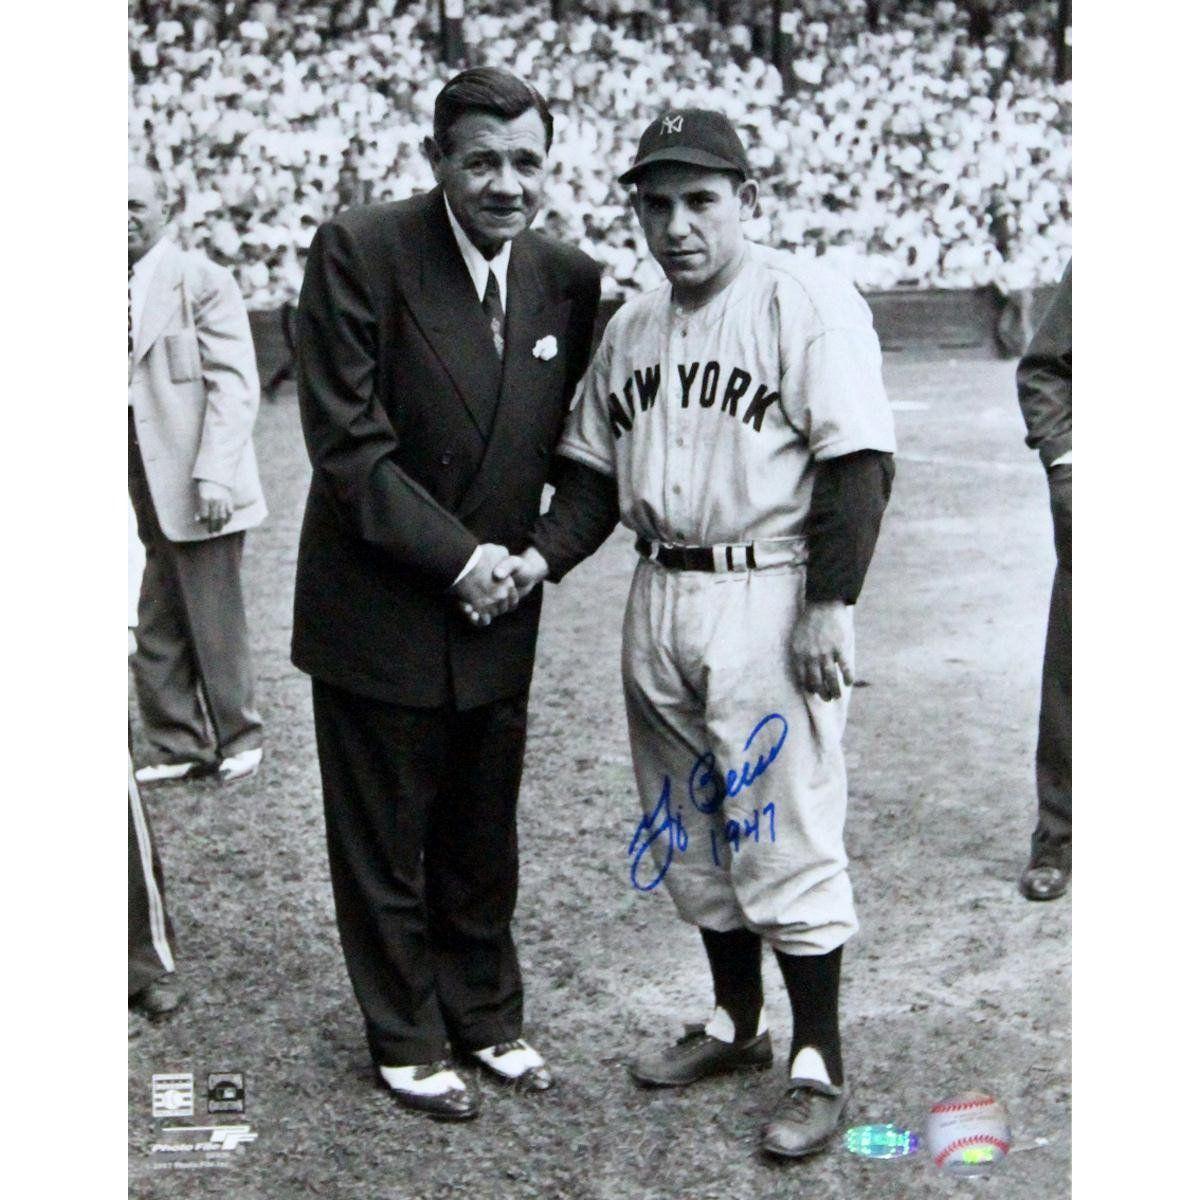 Yogi Berra W Babe Ruth Bw 11x14 Vertical Photo W 1947 Insc Yogi Berra New York Yankees Babe Ruth